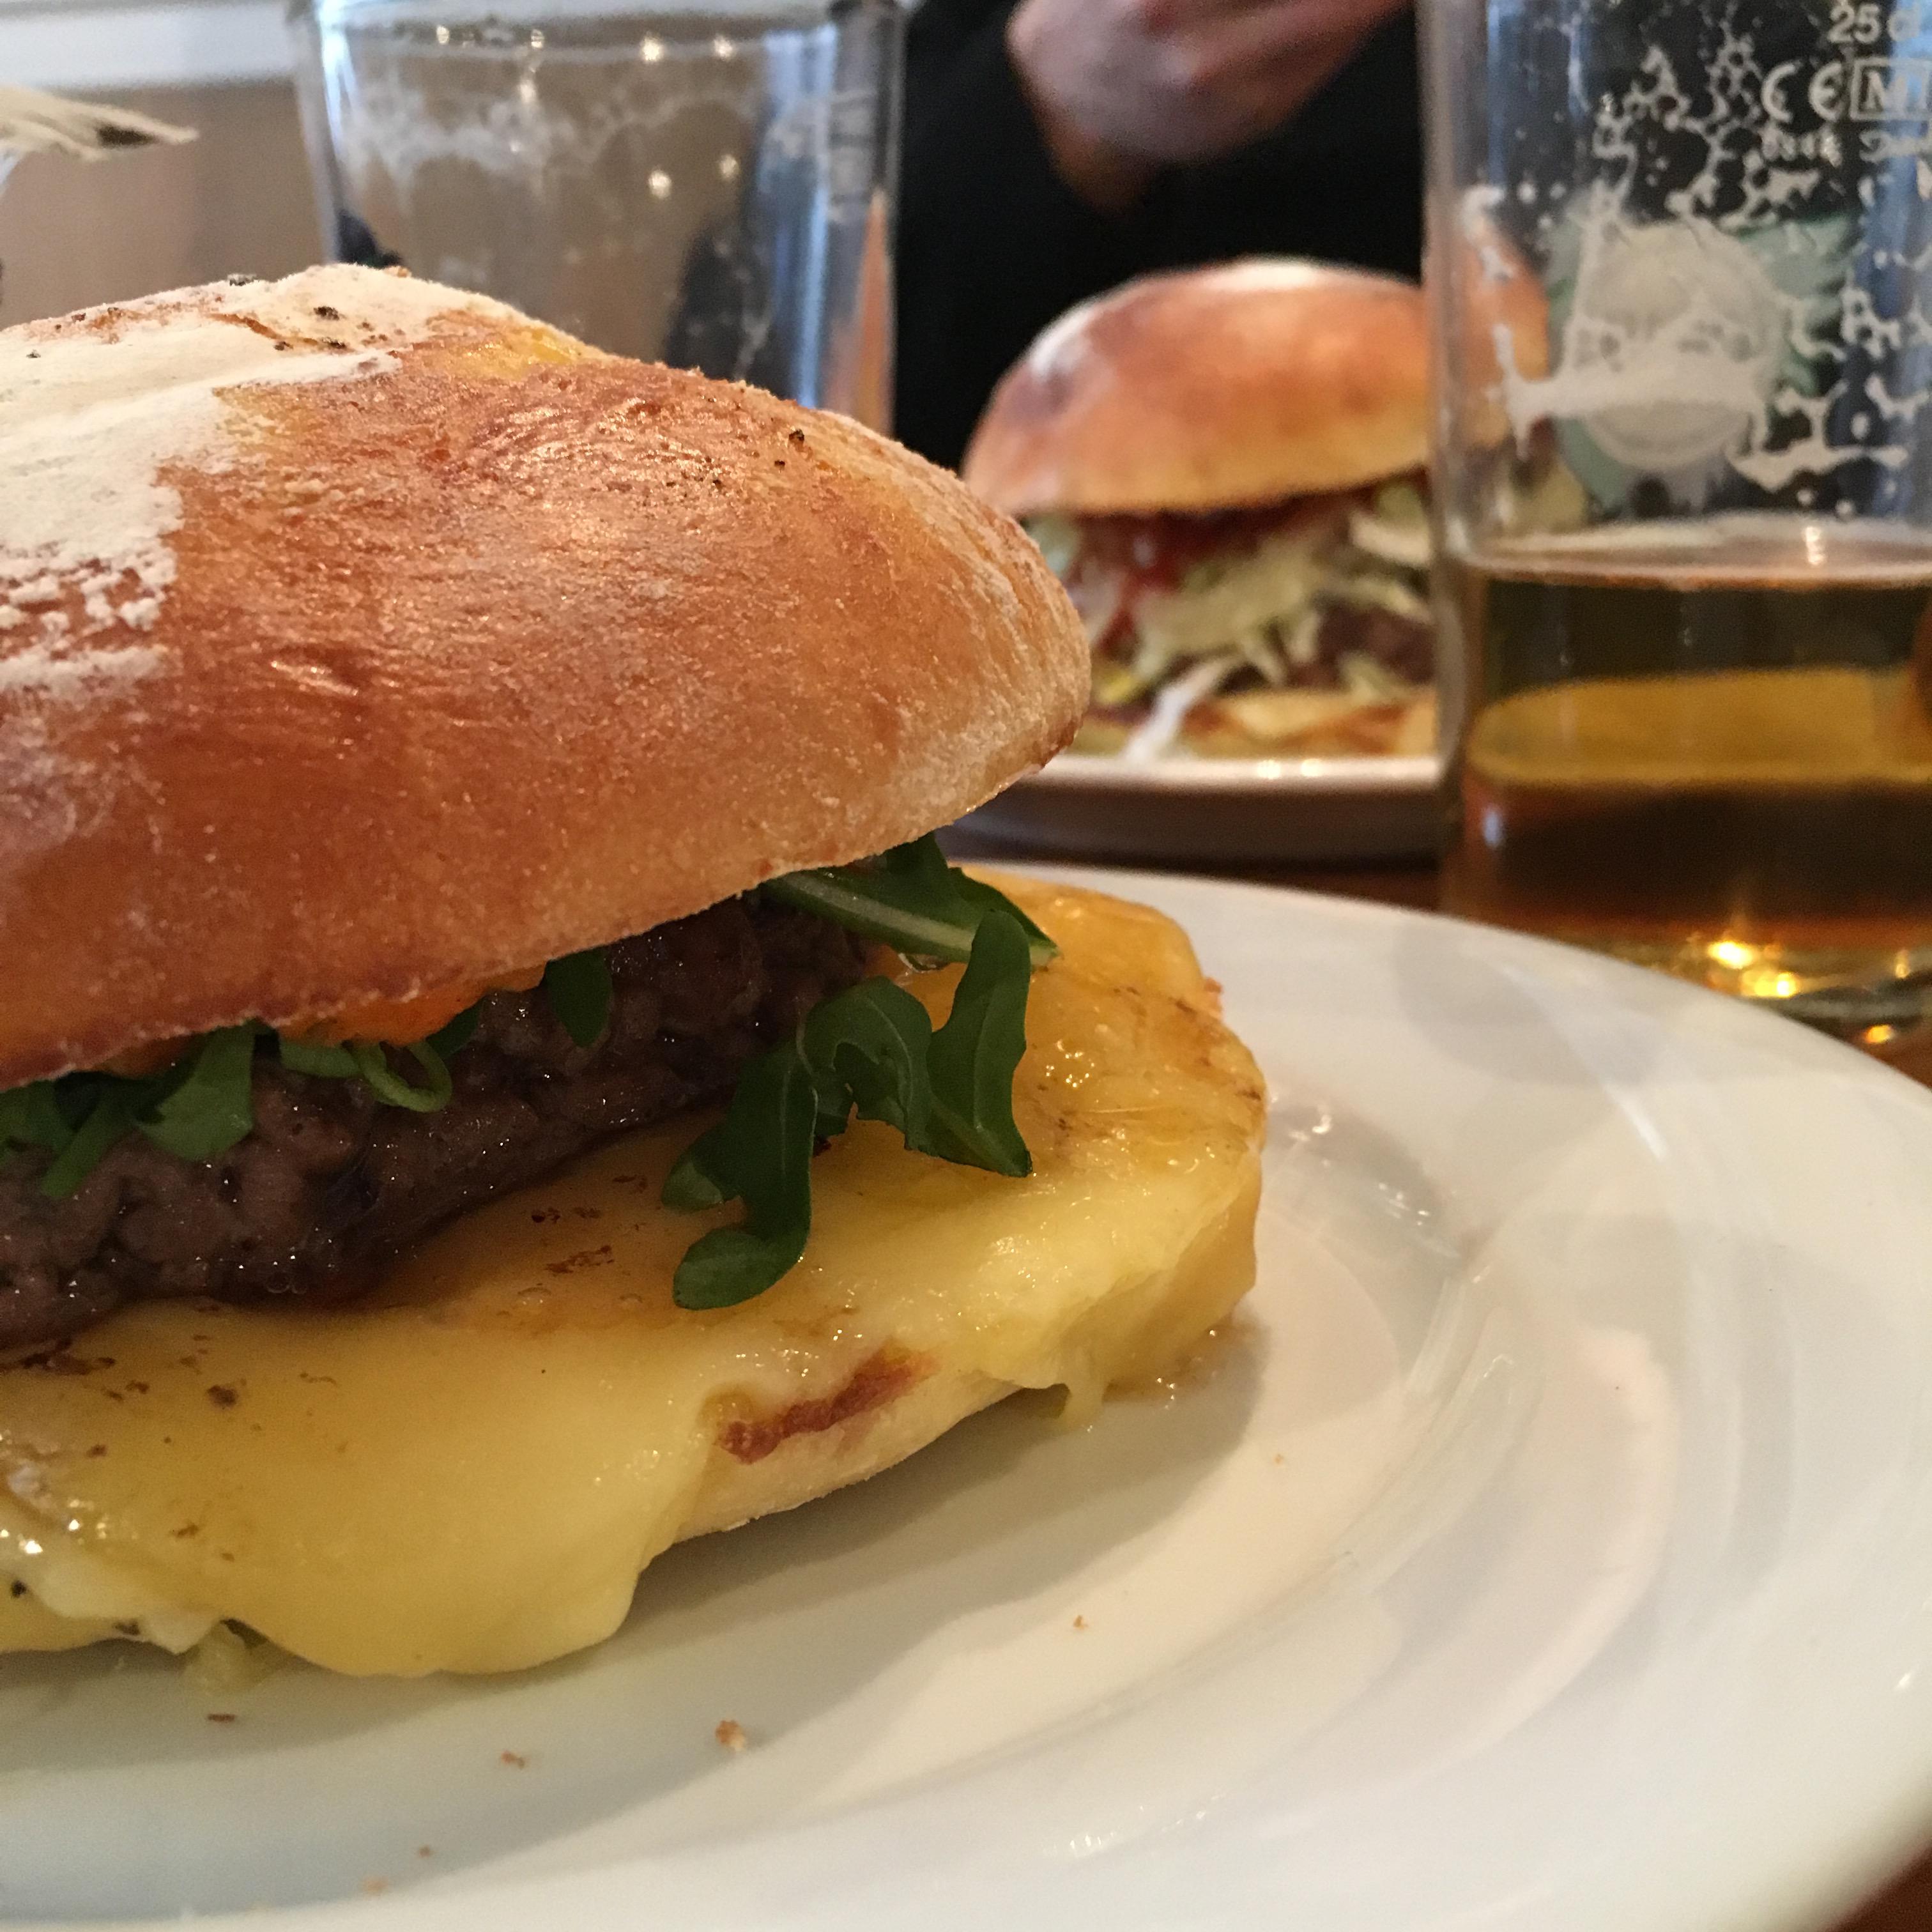 batignolles lesbatignolles paris17 restaurant bistrotleh burger food yummy